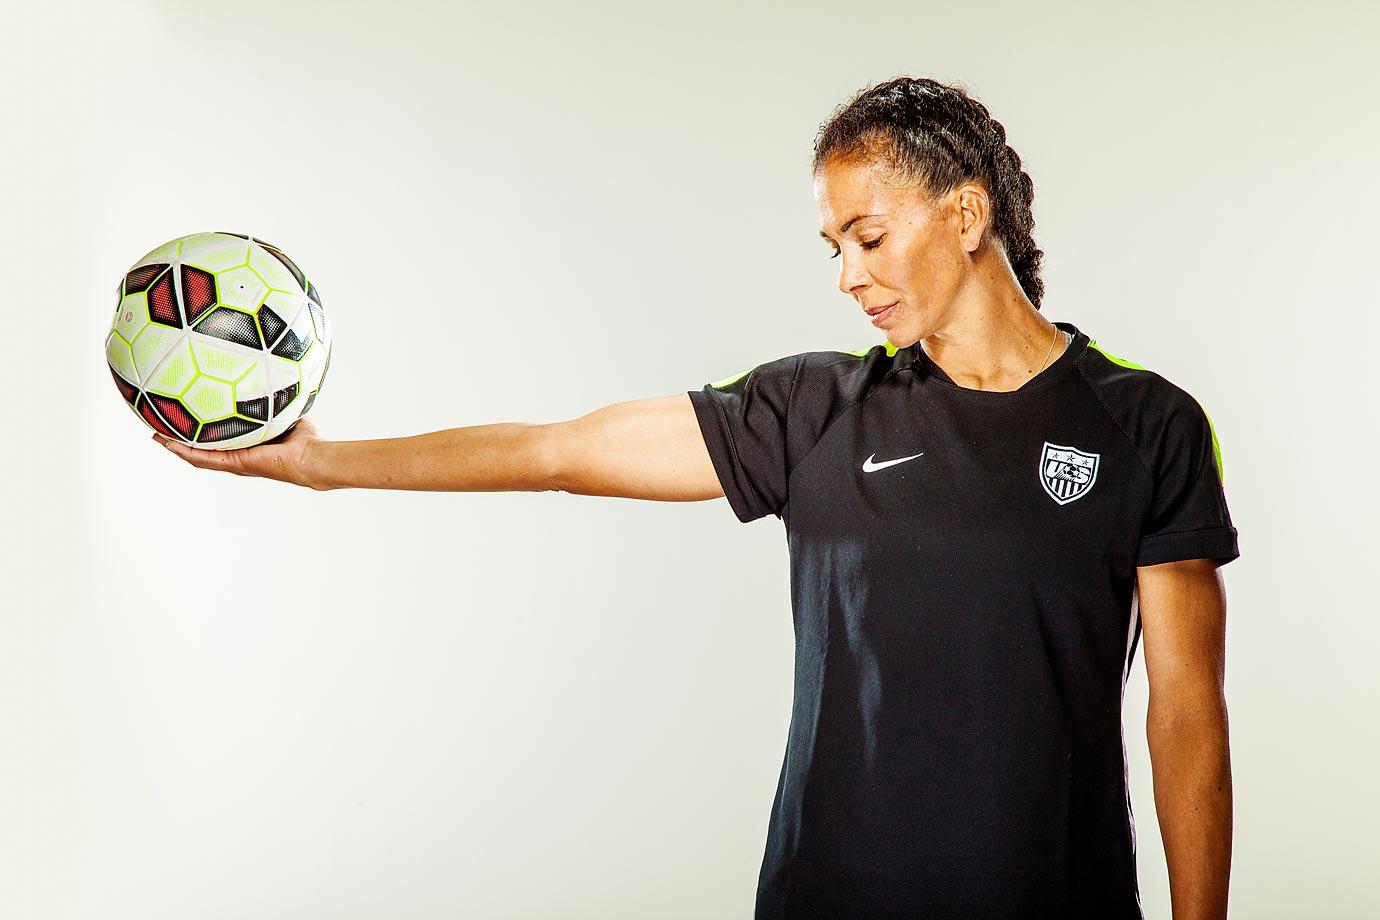 Meet the U.S. Women's World Cup team: Midfielder Shannon Boxx